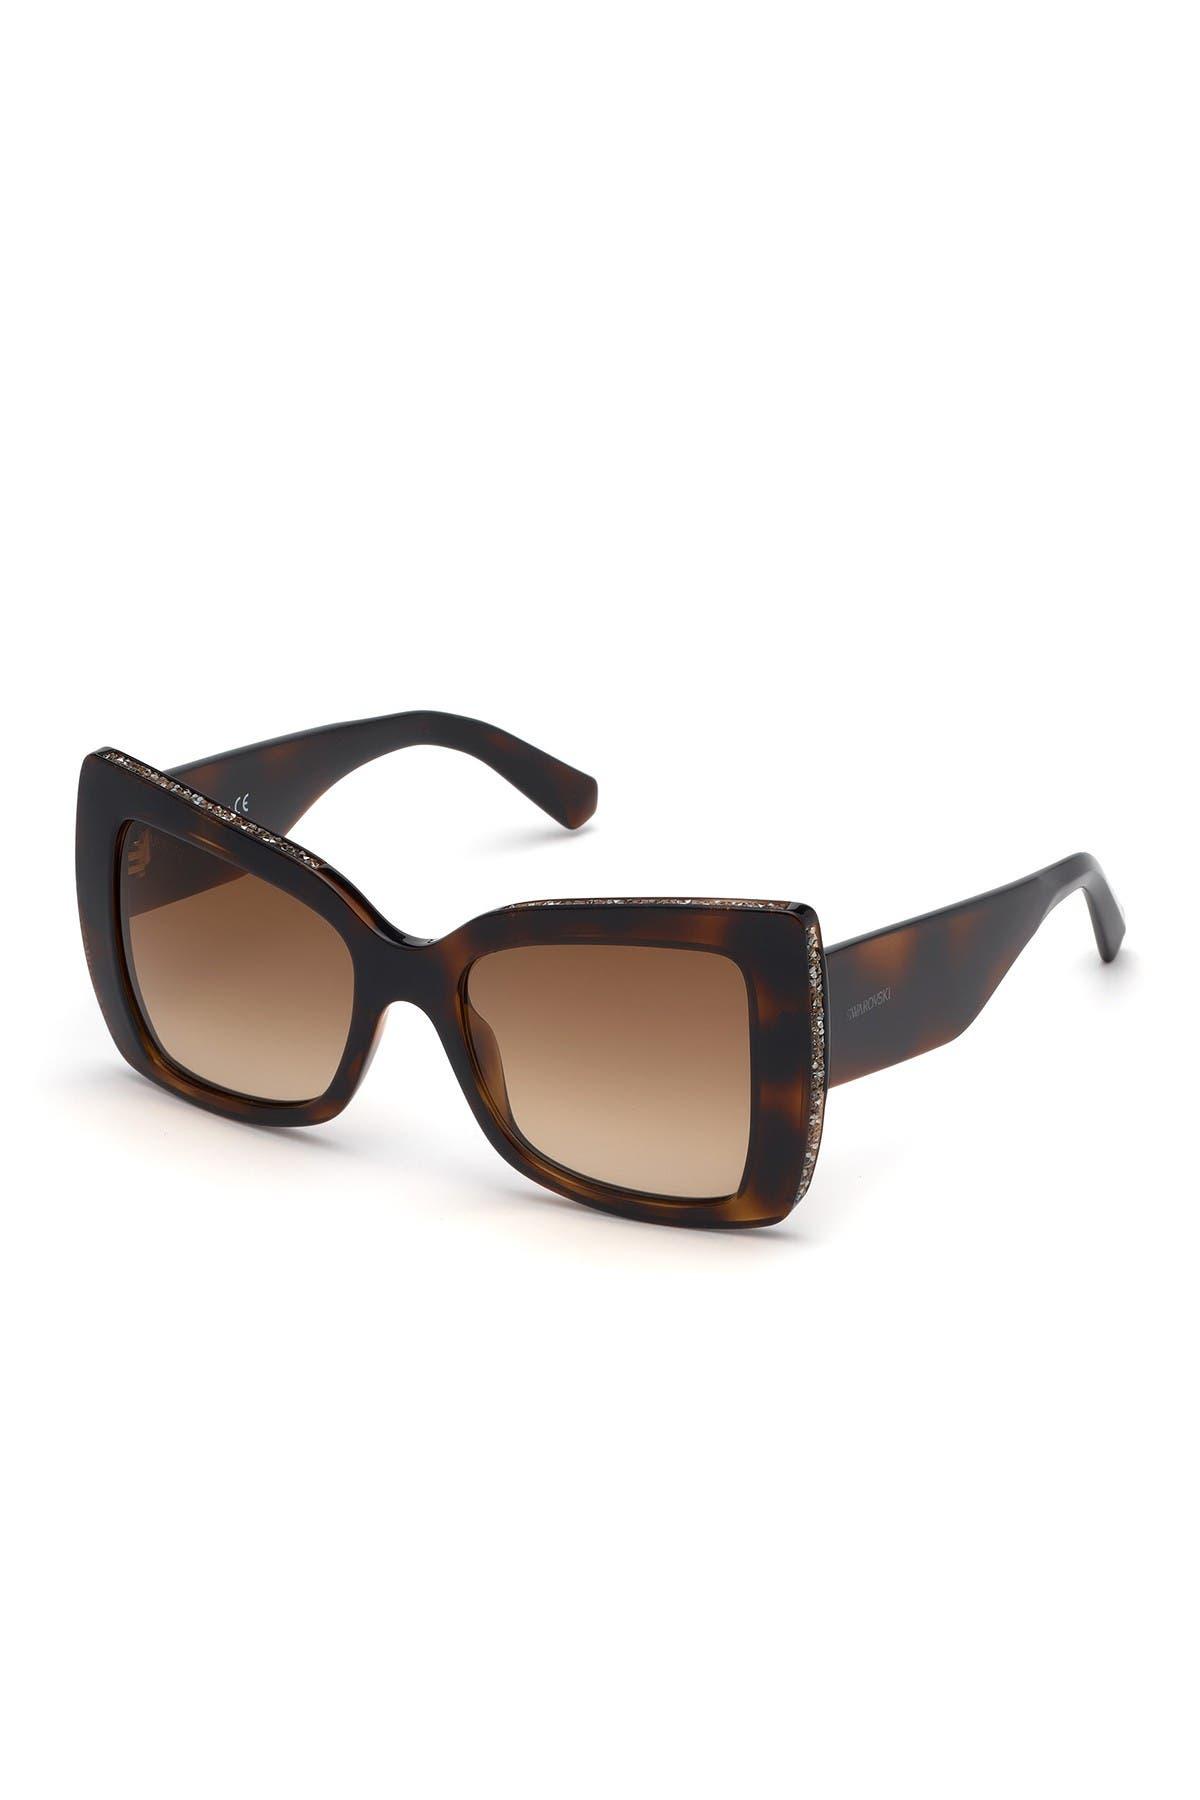 Image of Swarovski Butterfly 52mm Sunglasses